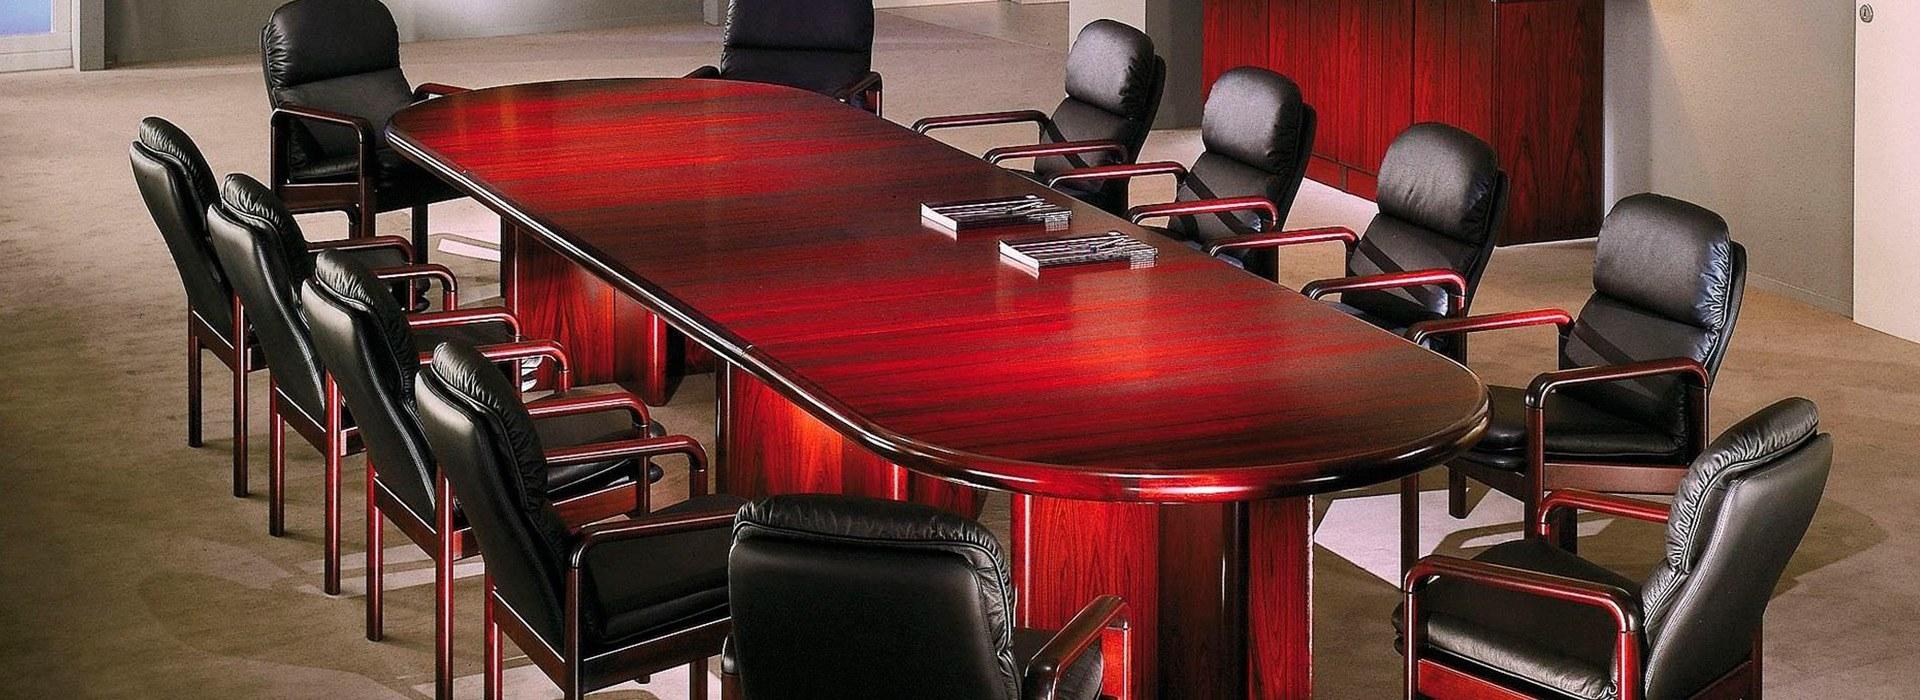 Furniture-Lab-Las-Vegas-Upholstery-0003